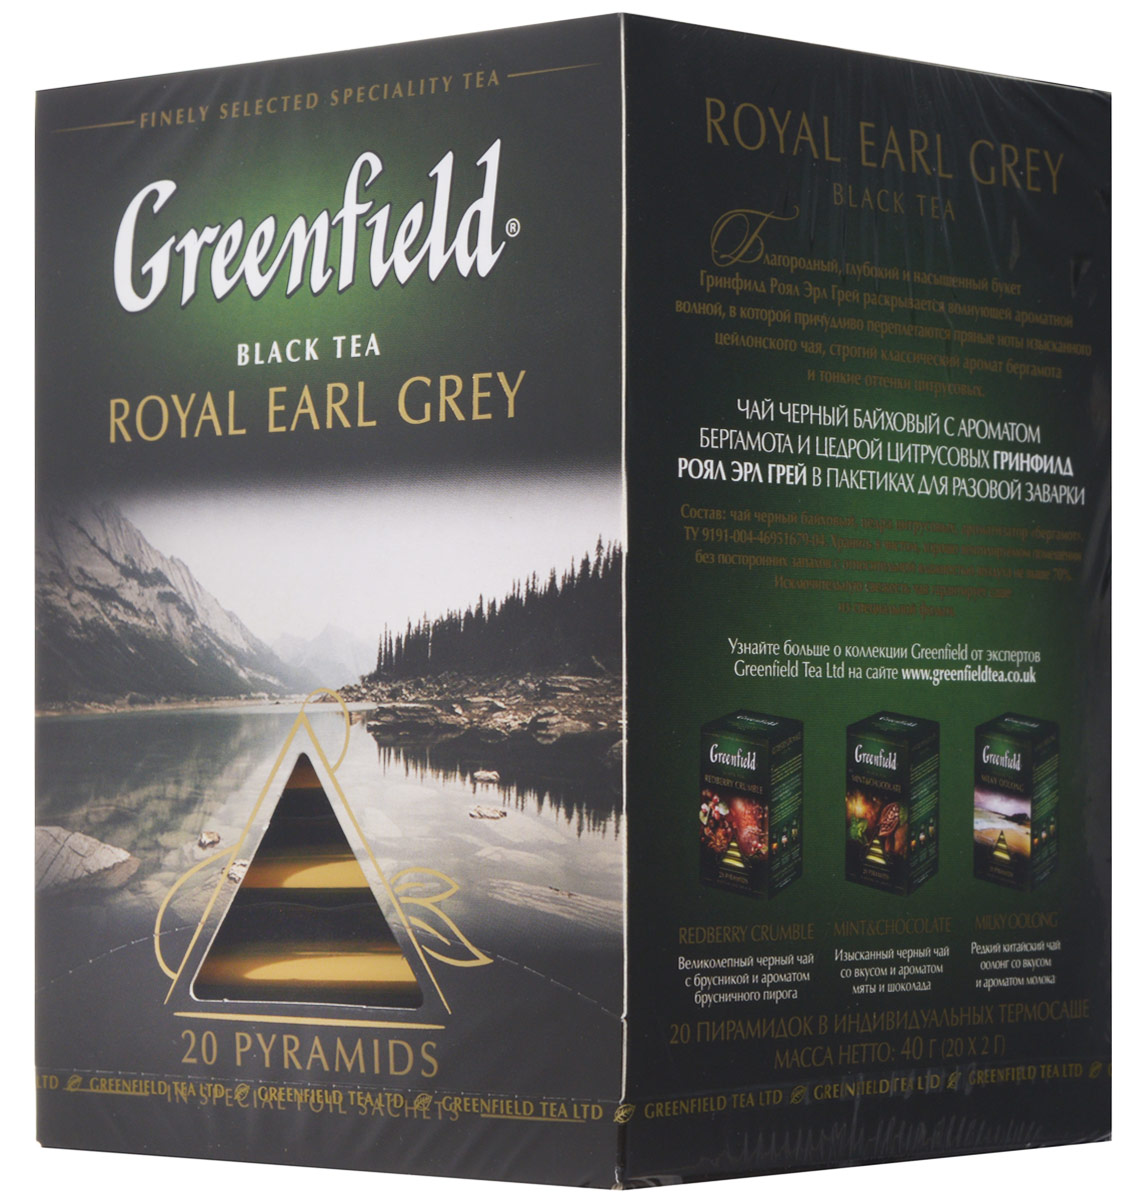 Greenfield Royal Earl Grey черный чай в пирамидках, 20 шт greenfield classic breakfast черный листовой чай 100 г